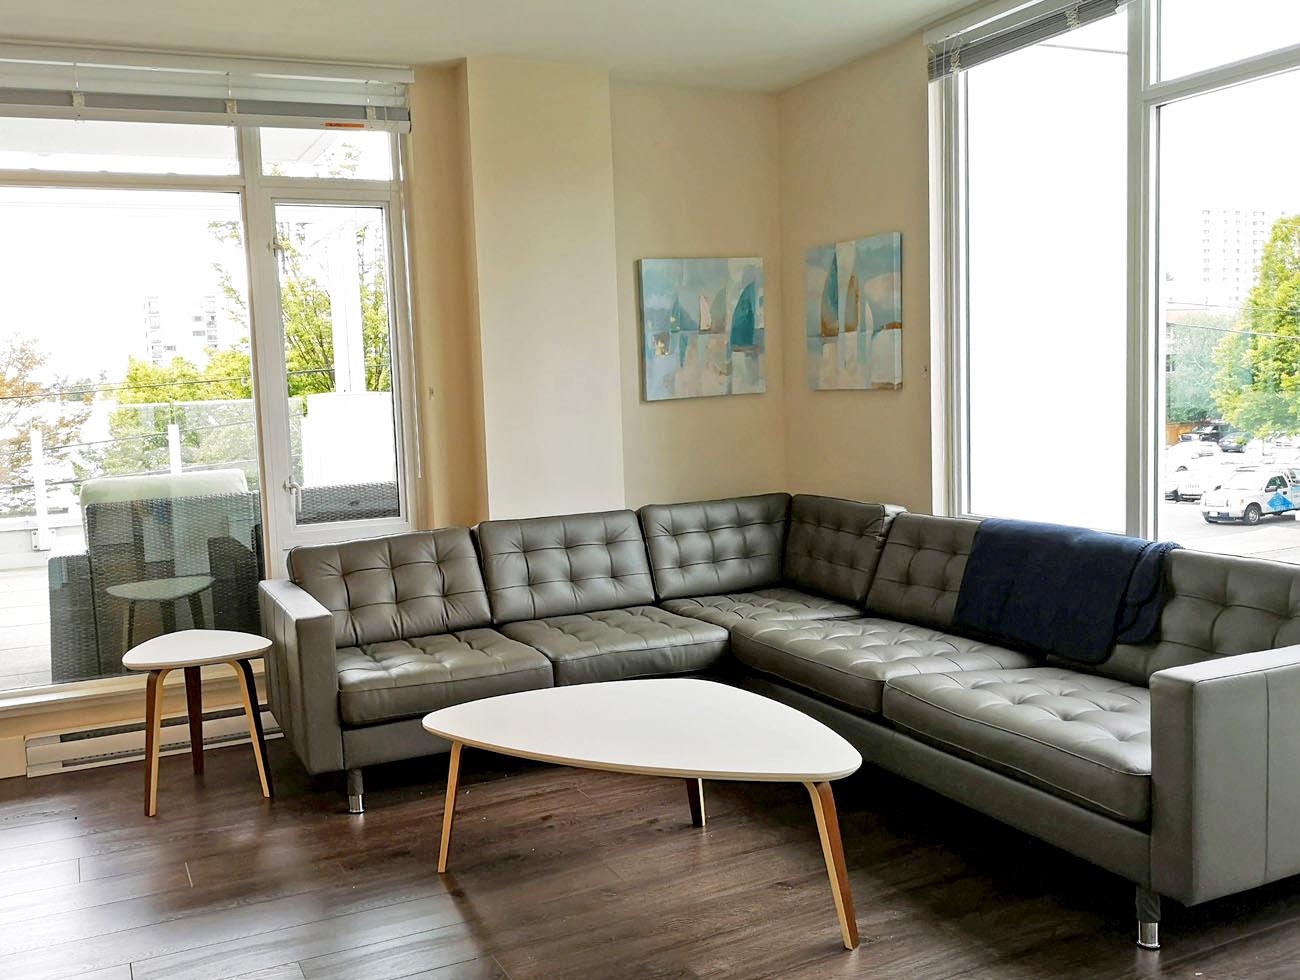 Victoria condo furnished living room